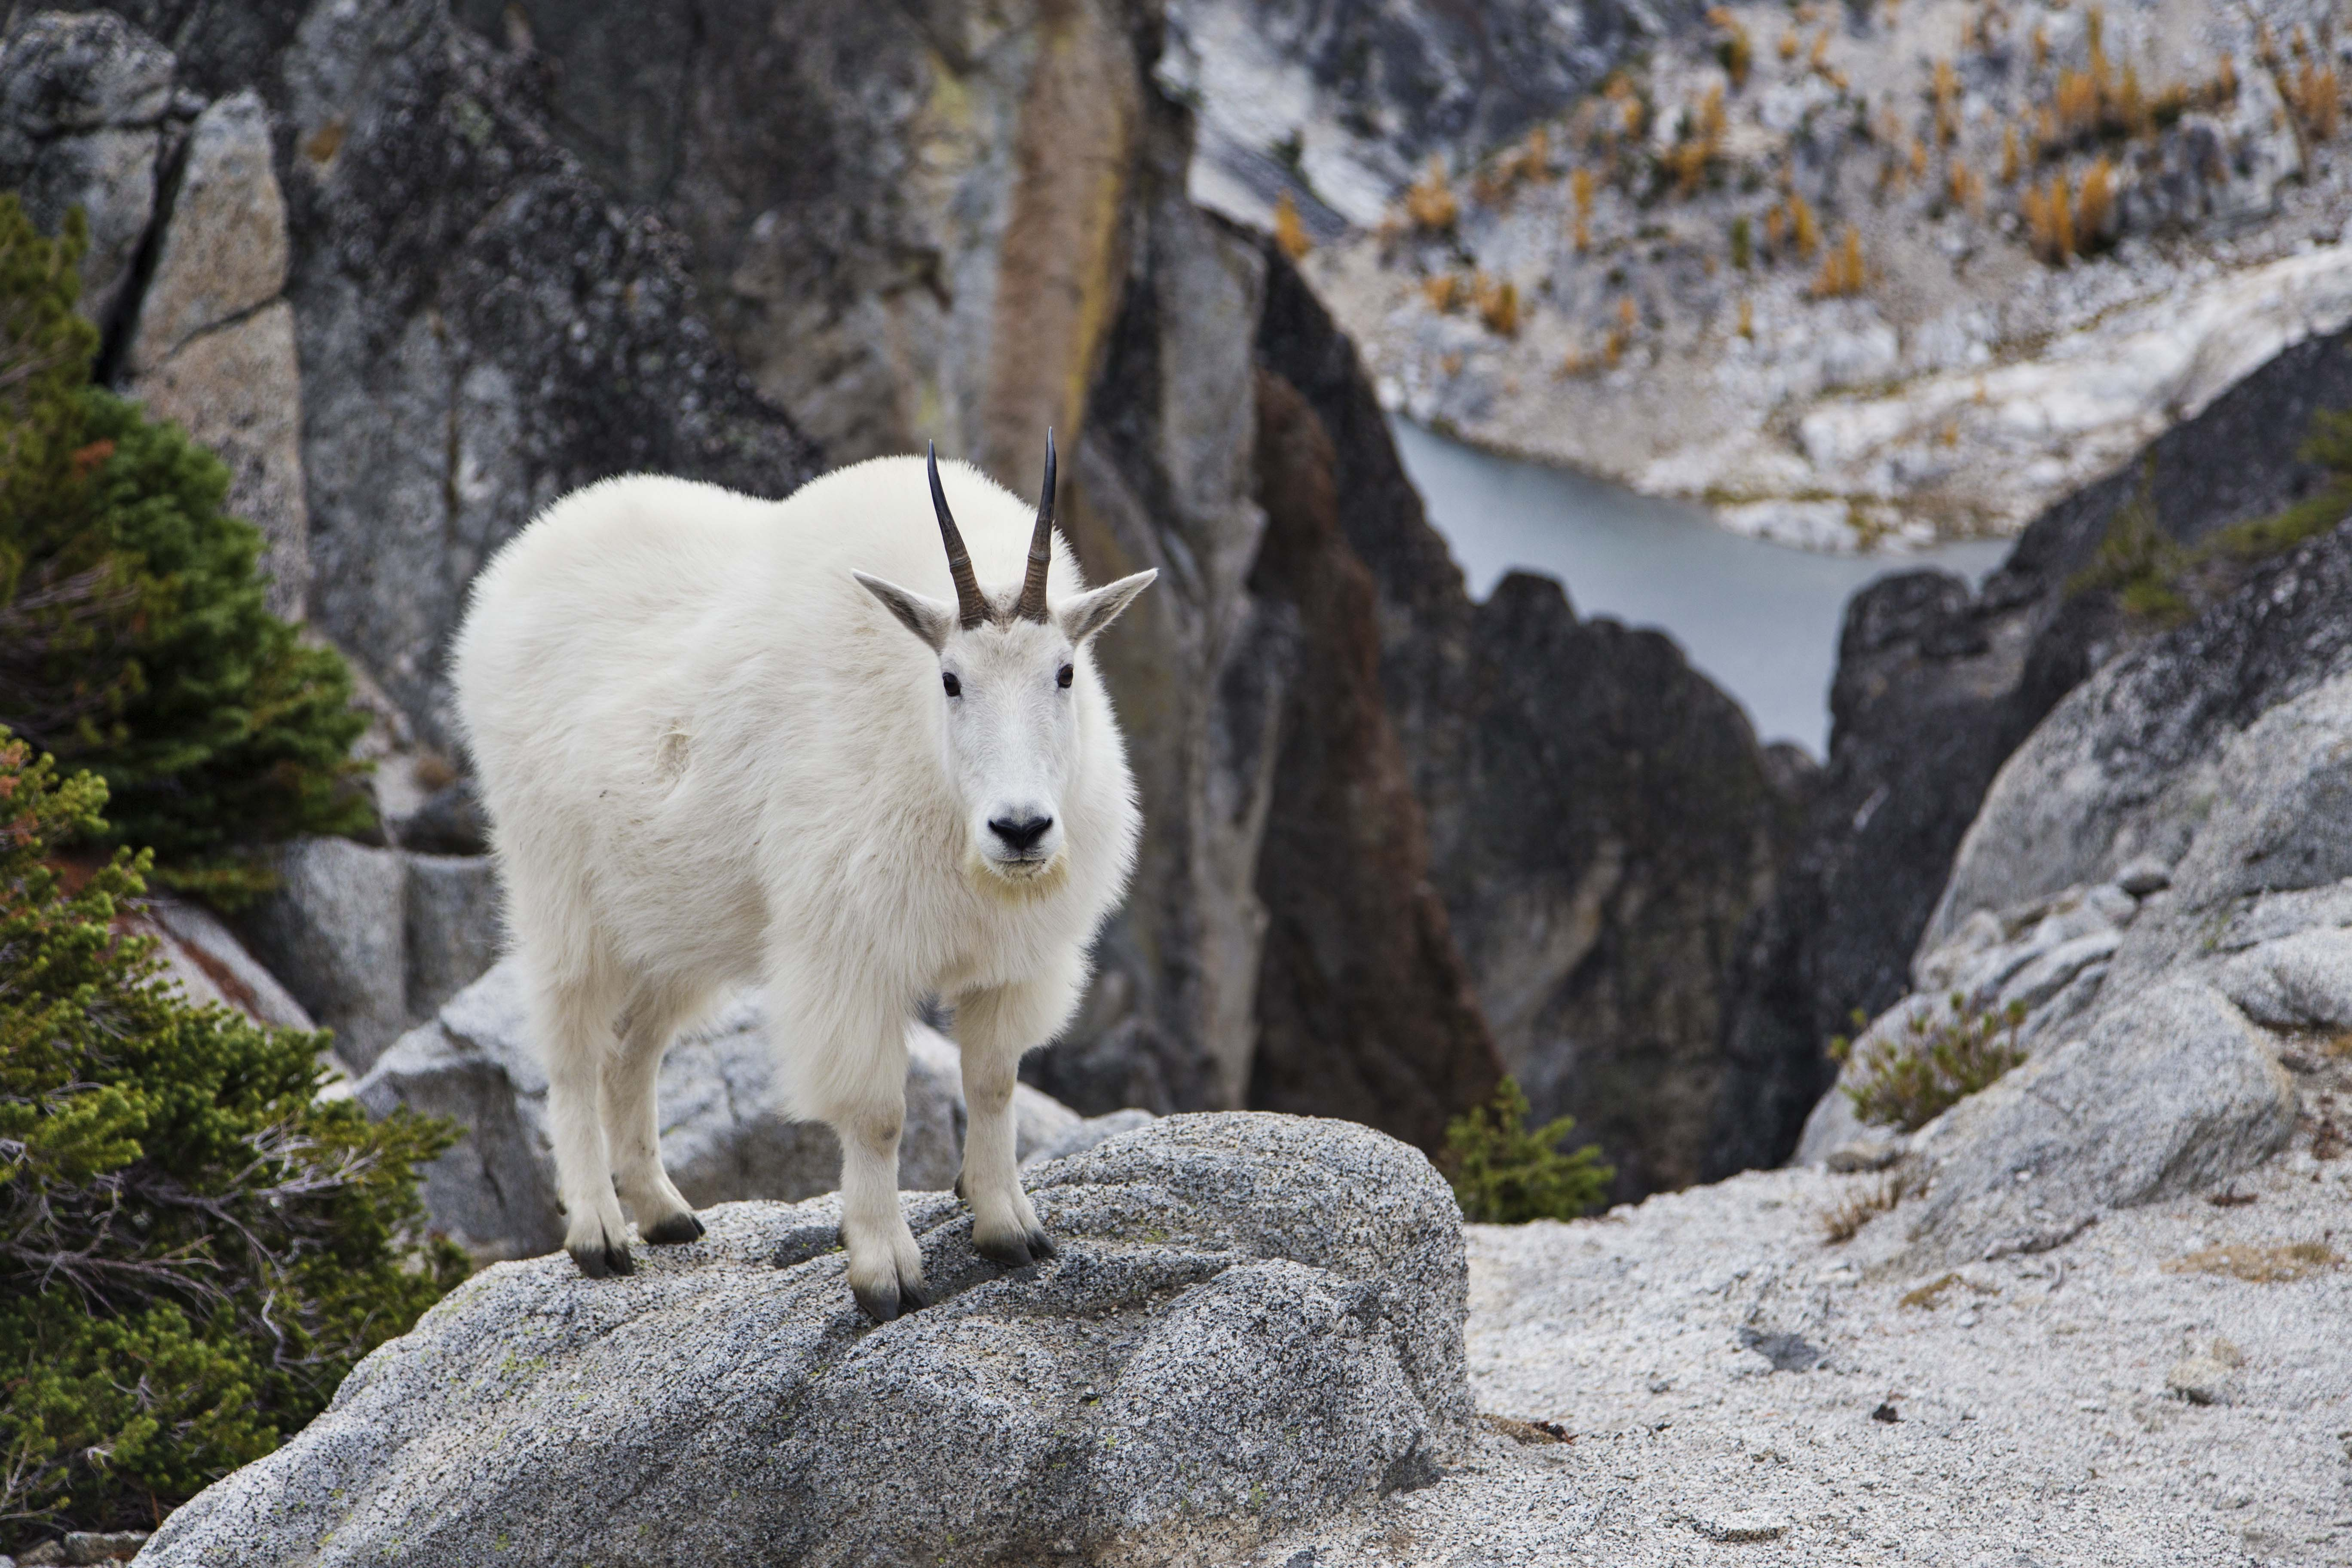 Gray mountain goats photo